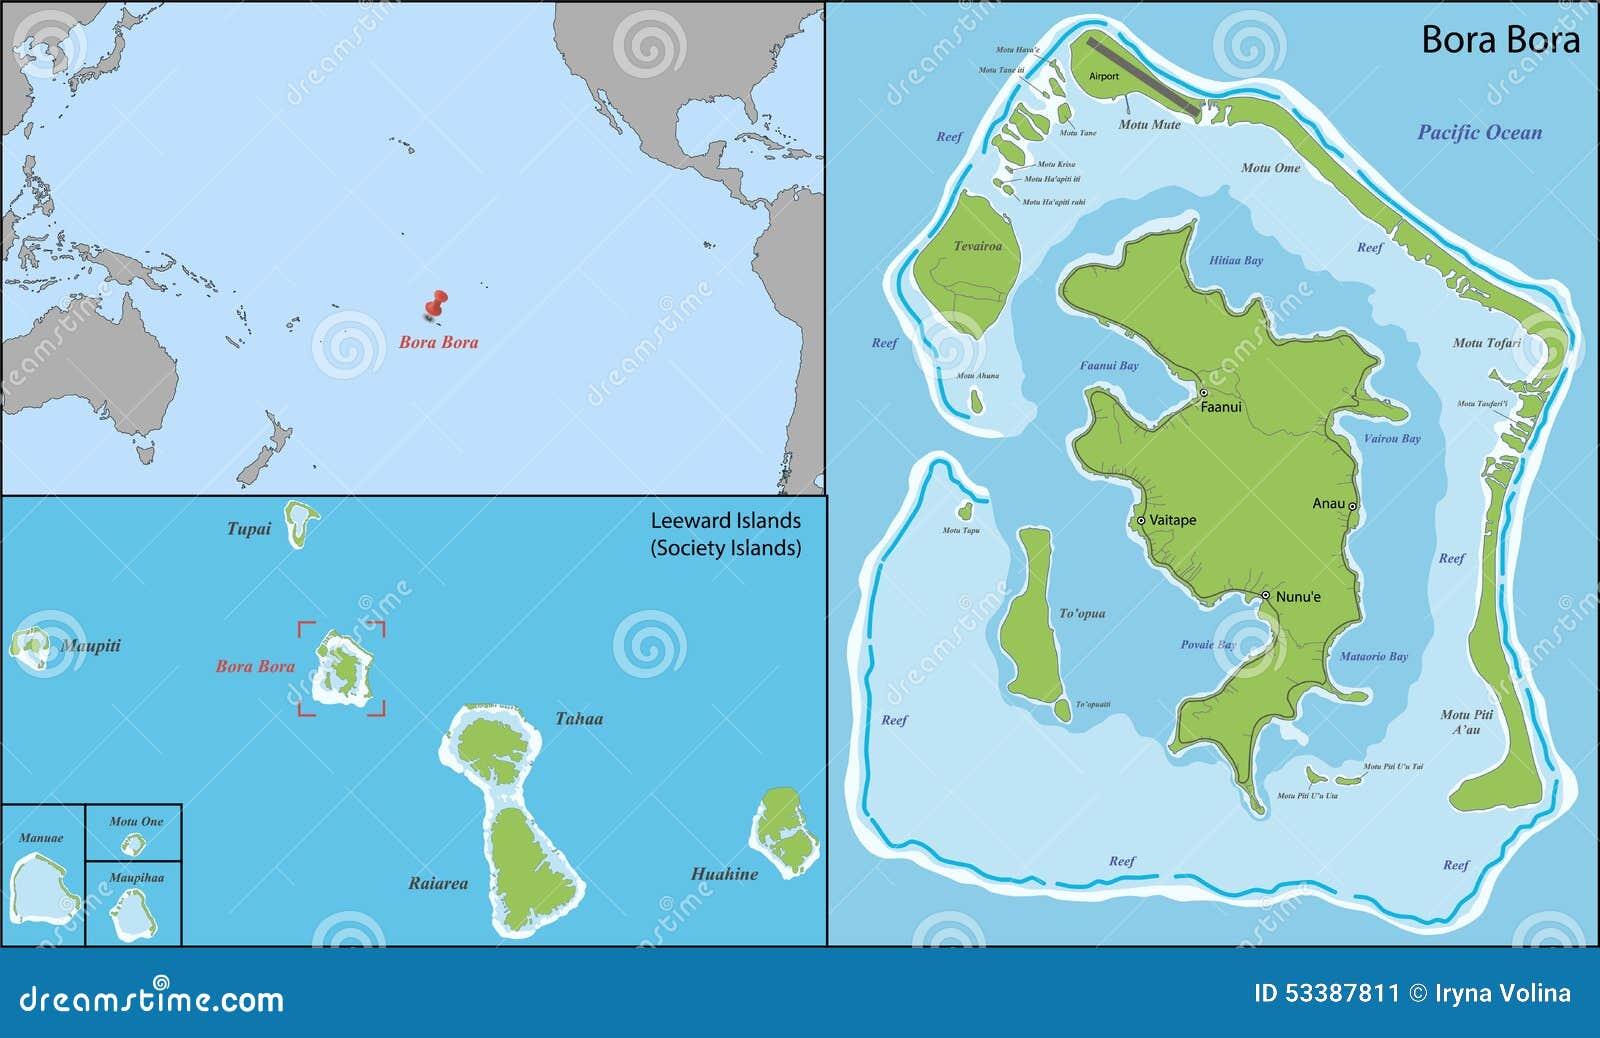 Bora bora map stock vector. Illustration of silhouette - 53387811